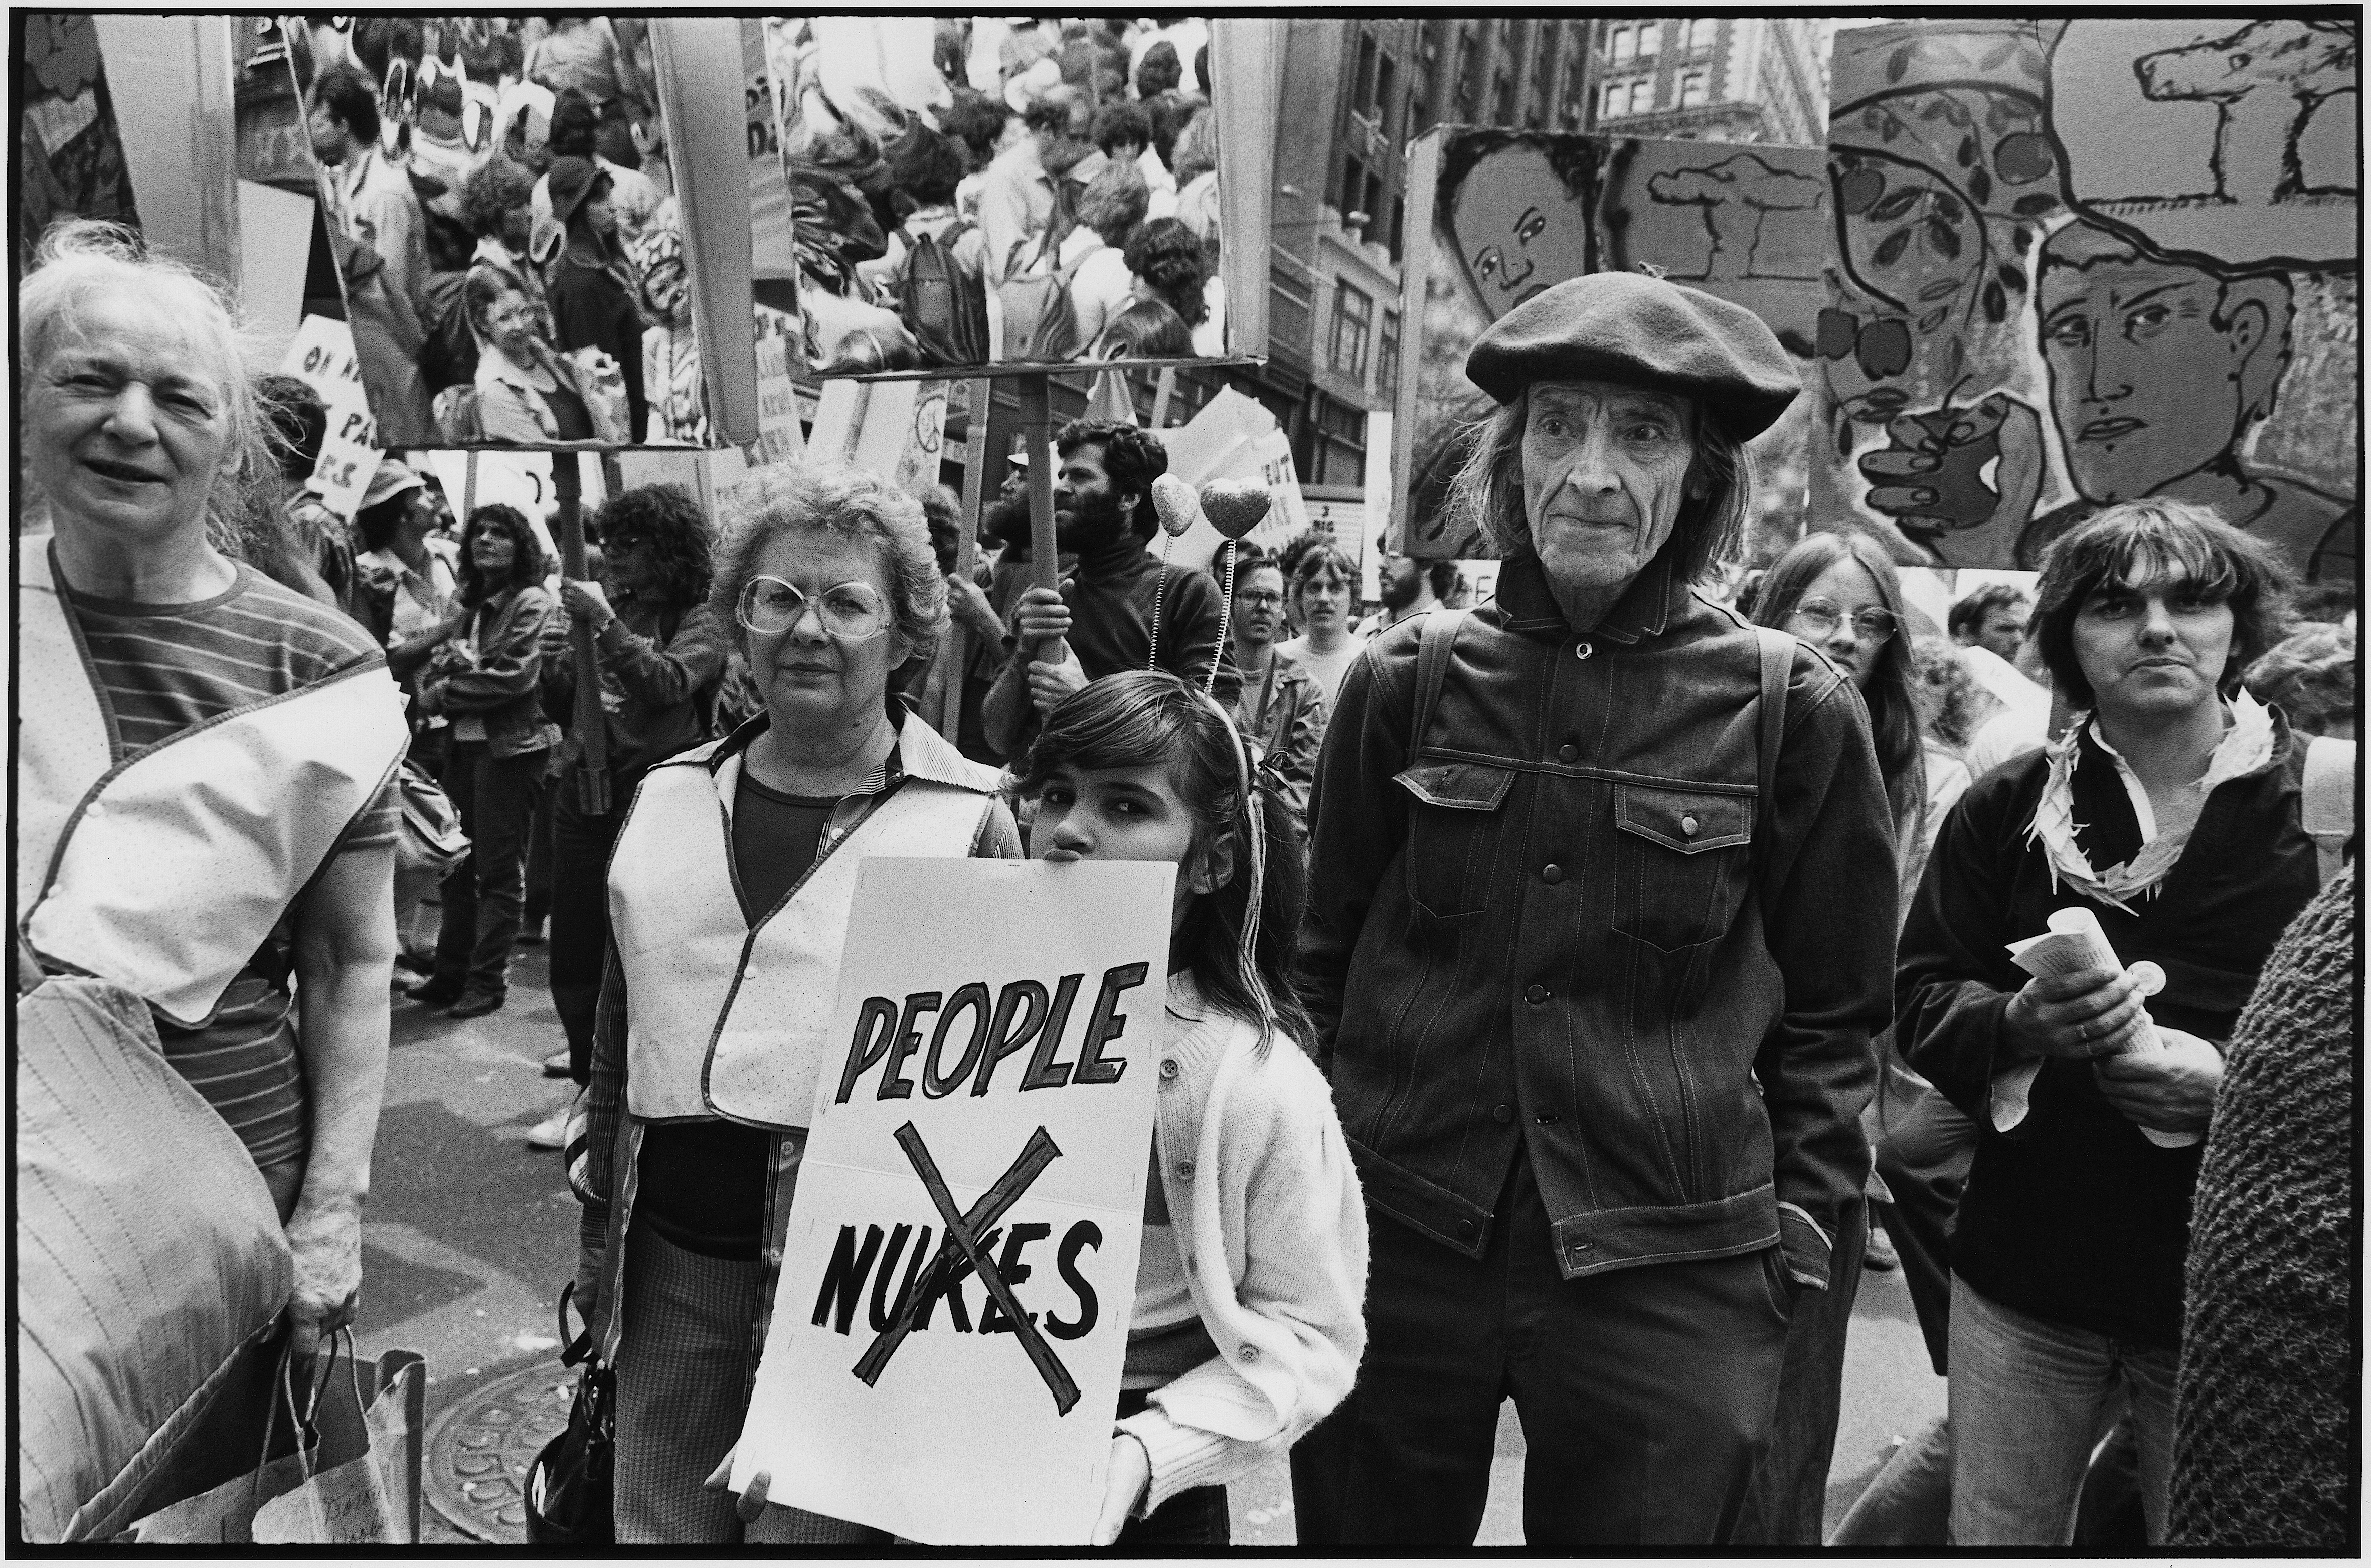 Anti-nuke march, June 12, 1982 Richard Sandler Photography